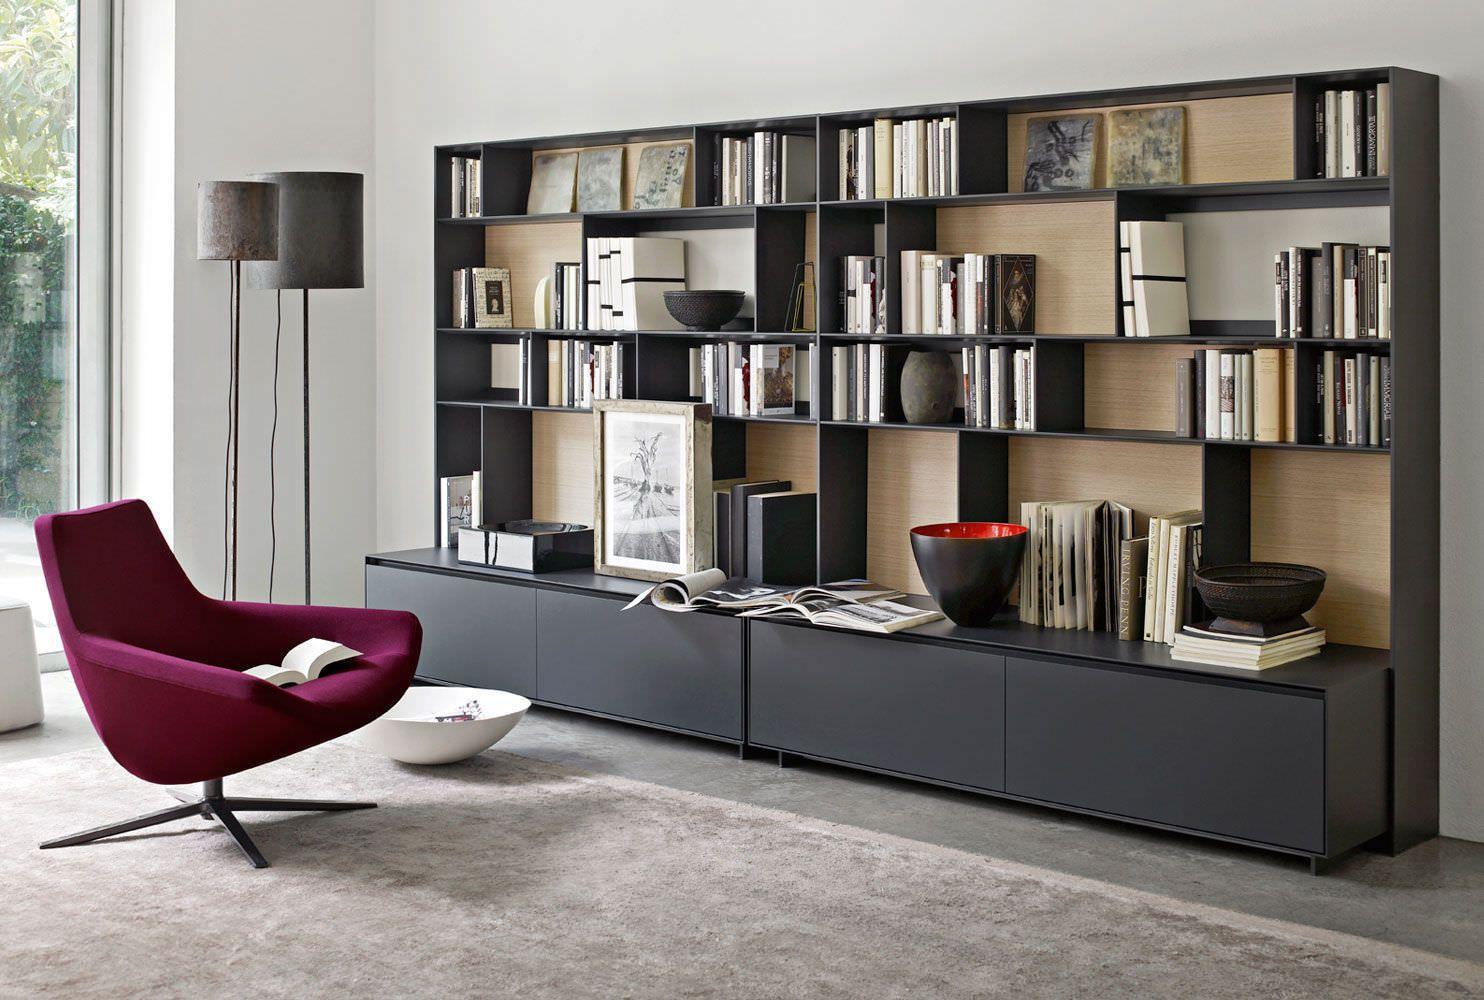 Modular Bookcase Contemporary Lacquered Wood Aluminum Flat C  # Muebles Bibliotecas Modulares